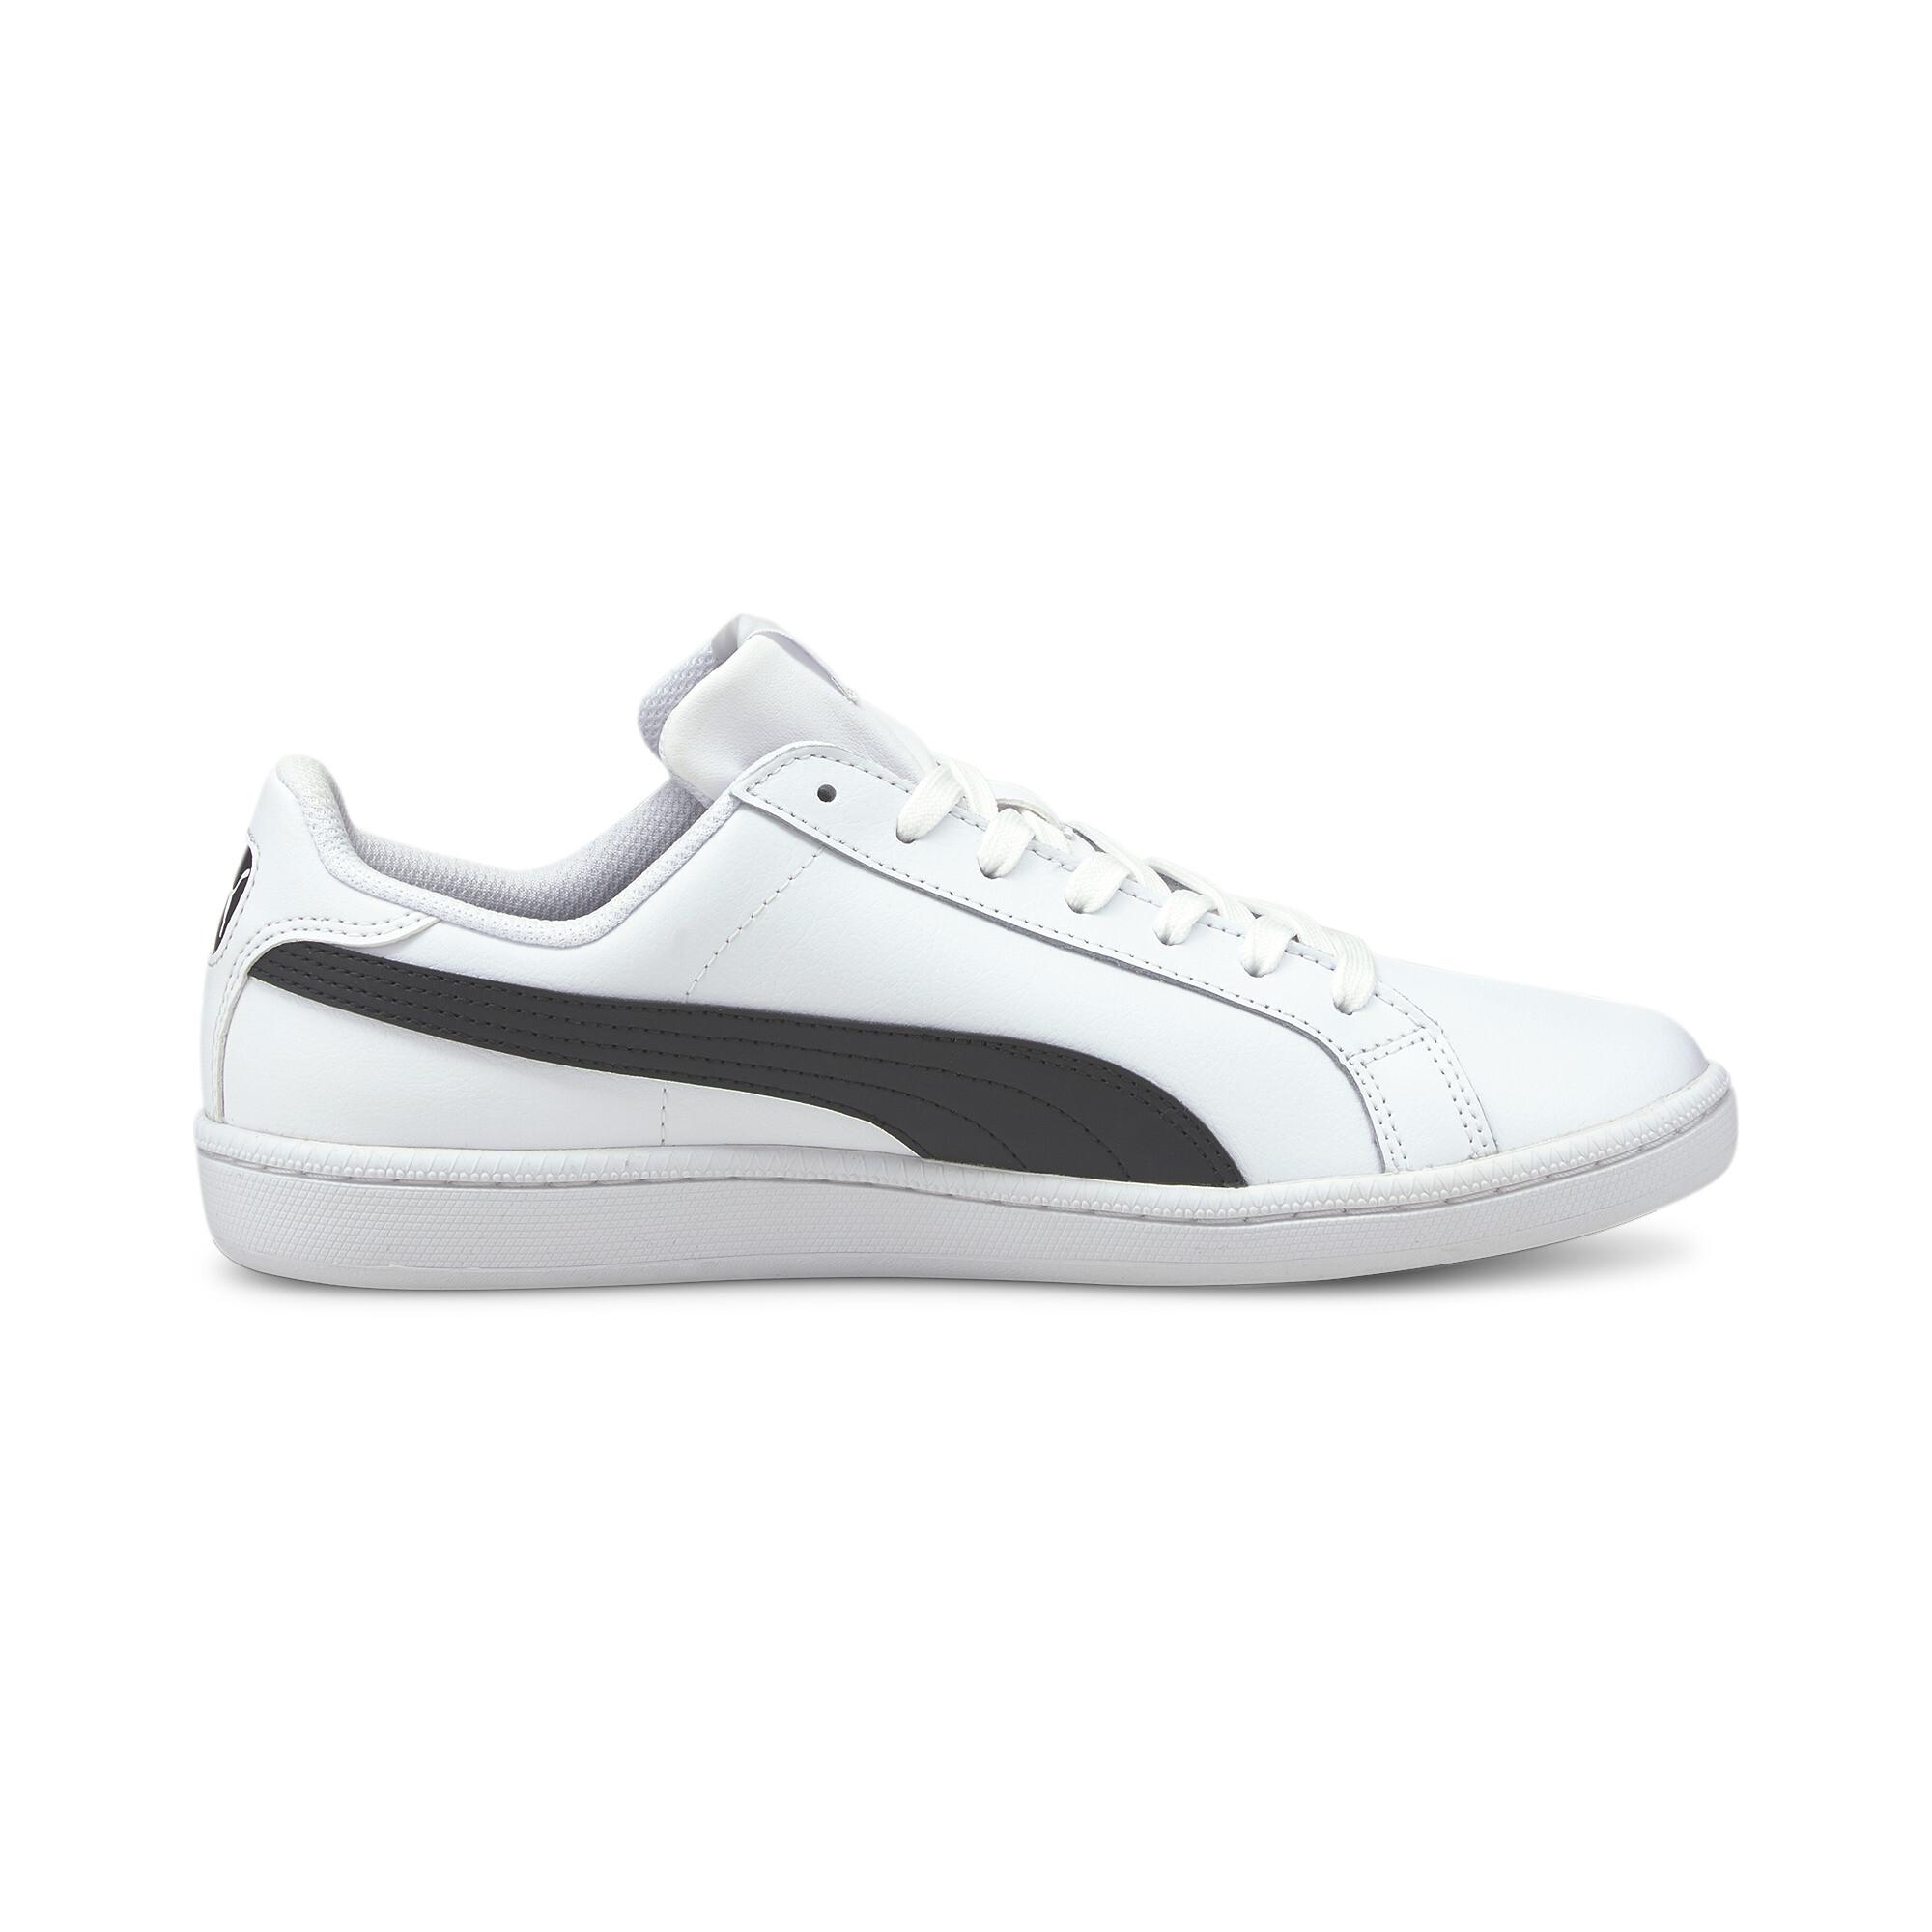 PUMA-Smash-Trainers-Schuhe-Sneakers-Sport-Classics-Unisex-Neu Indexbild 11